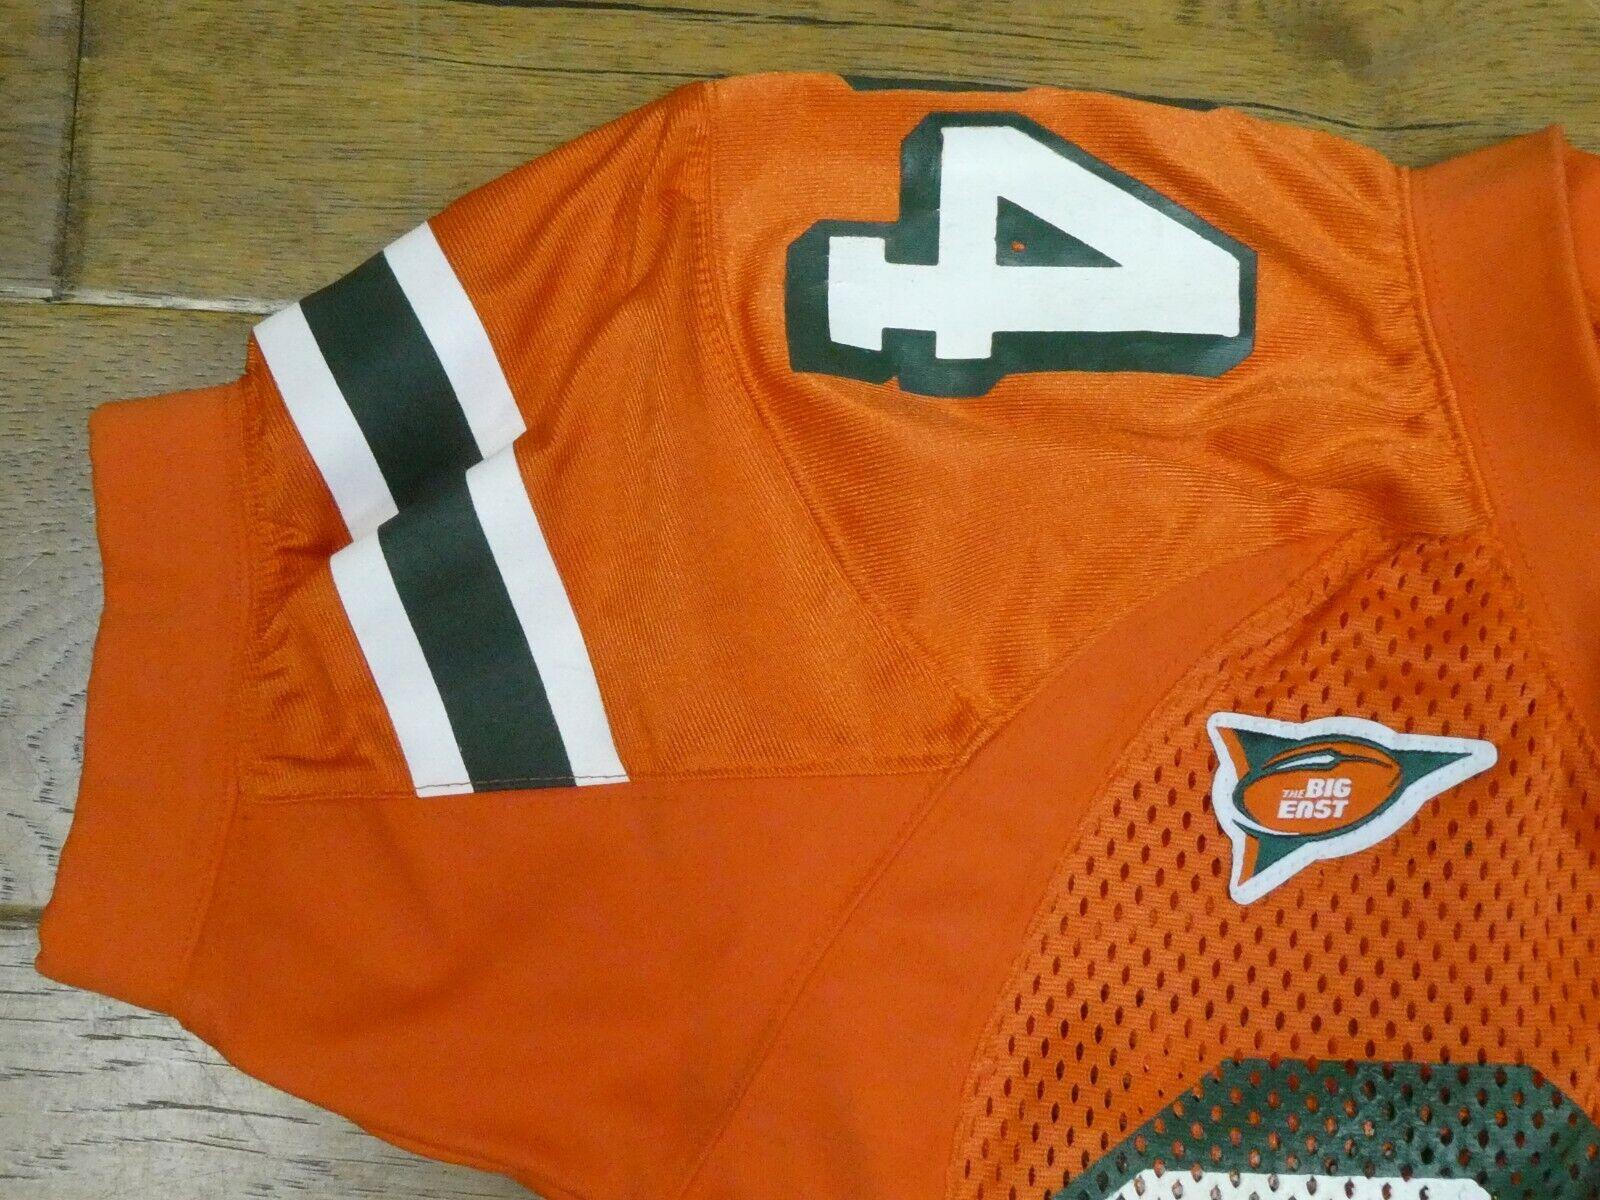 Jarrett Payton Miami Hurricanes Game Used Football Jersey 2004 Orange Bowl MVP - $1,799.99